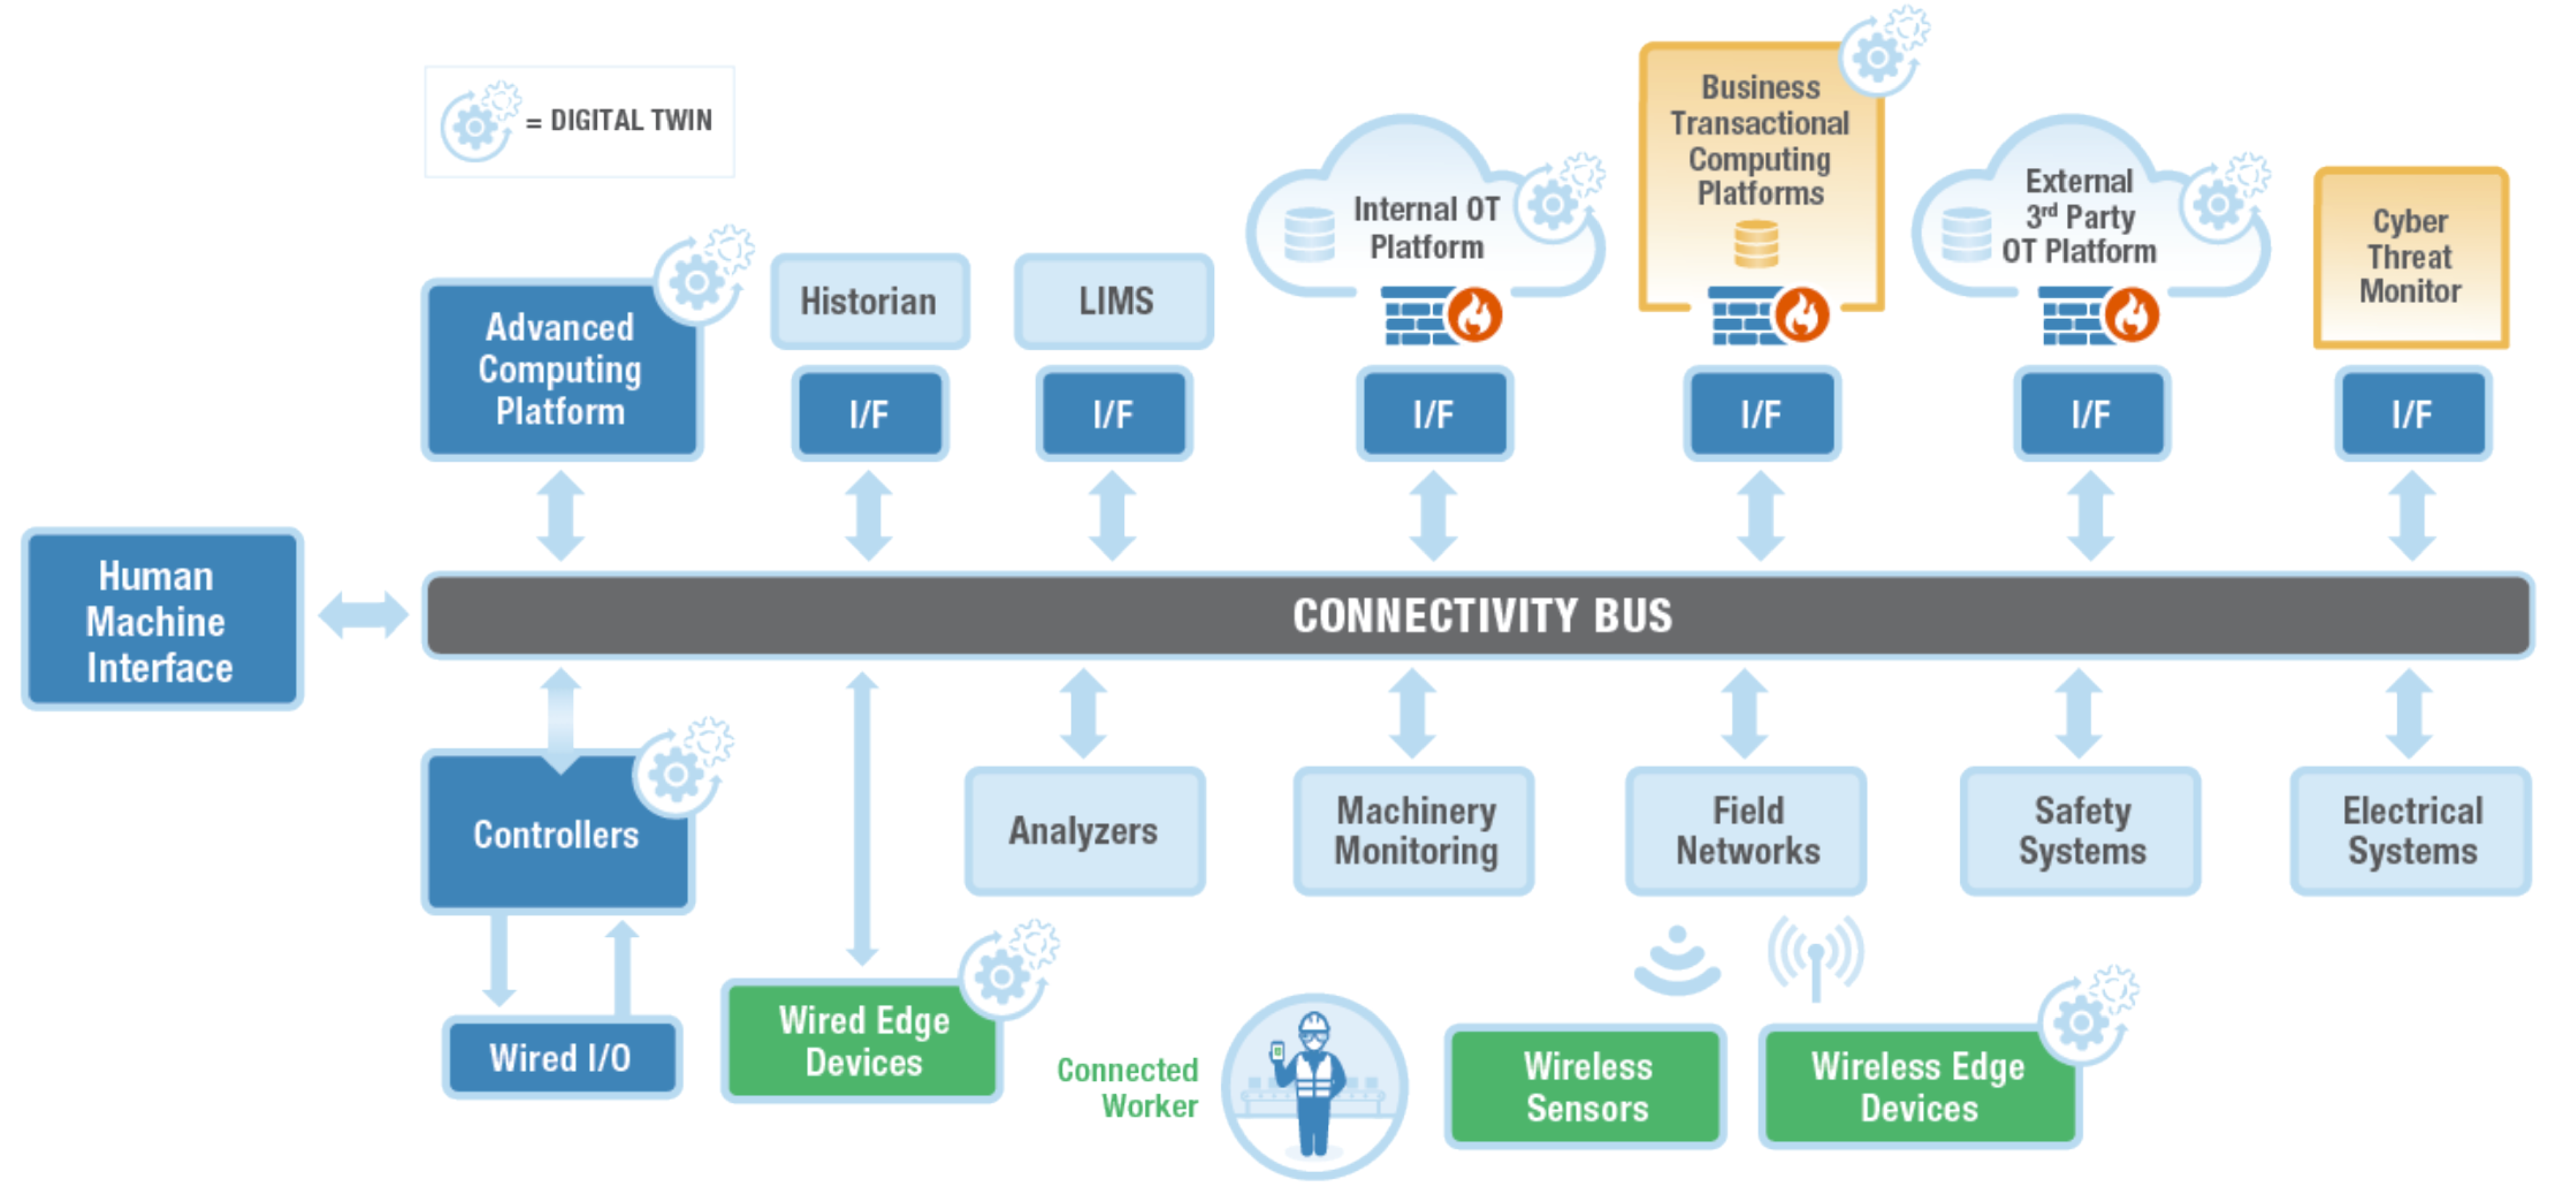 CONNECTIVITY BUS GRAPHIC-2